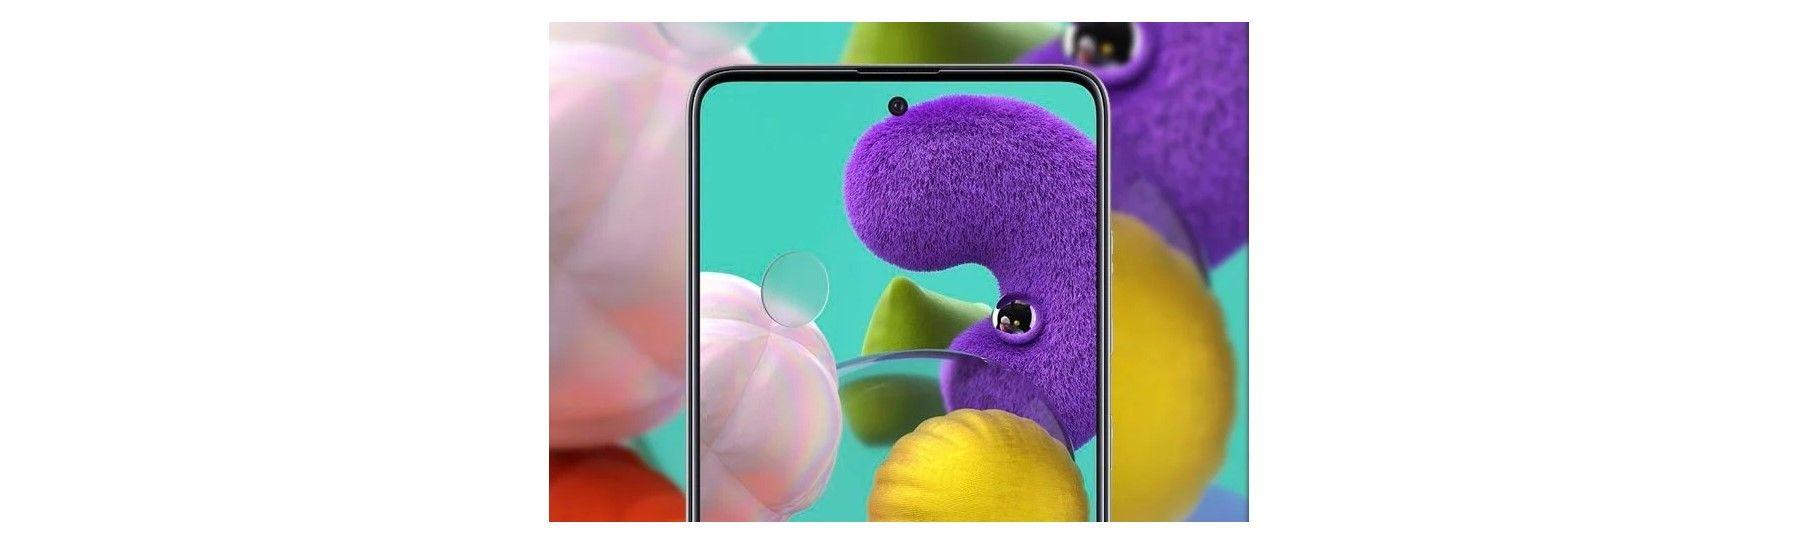 Samsung Galaxy A51 4 камеры